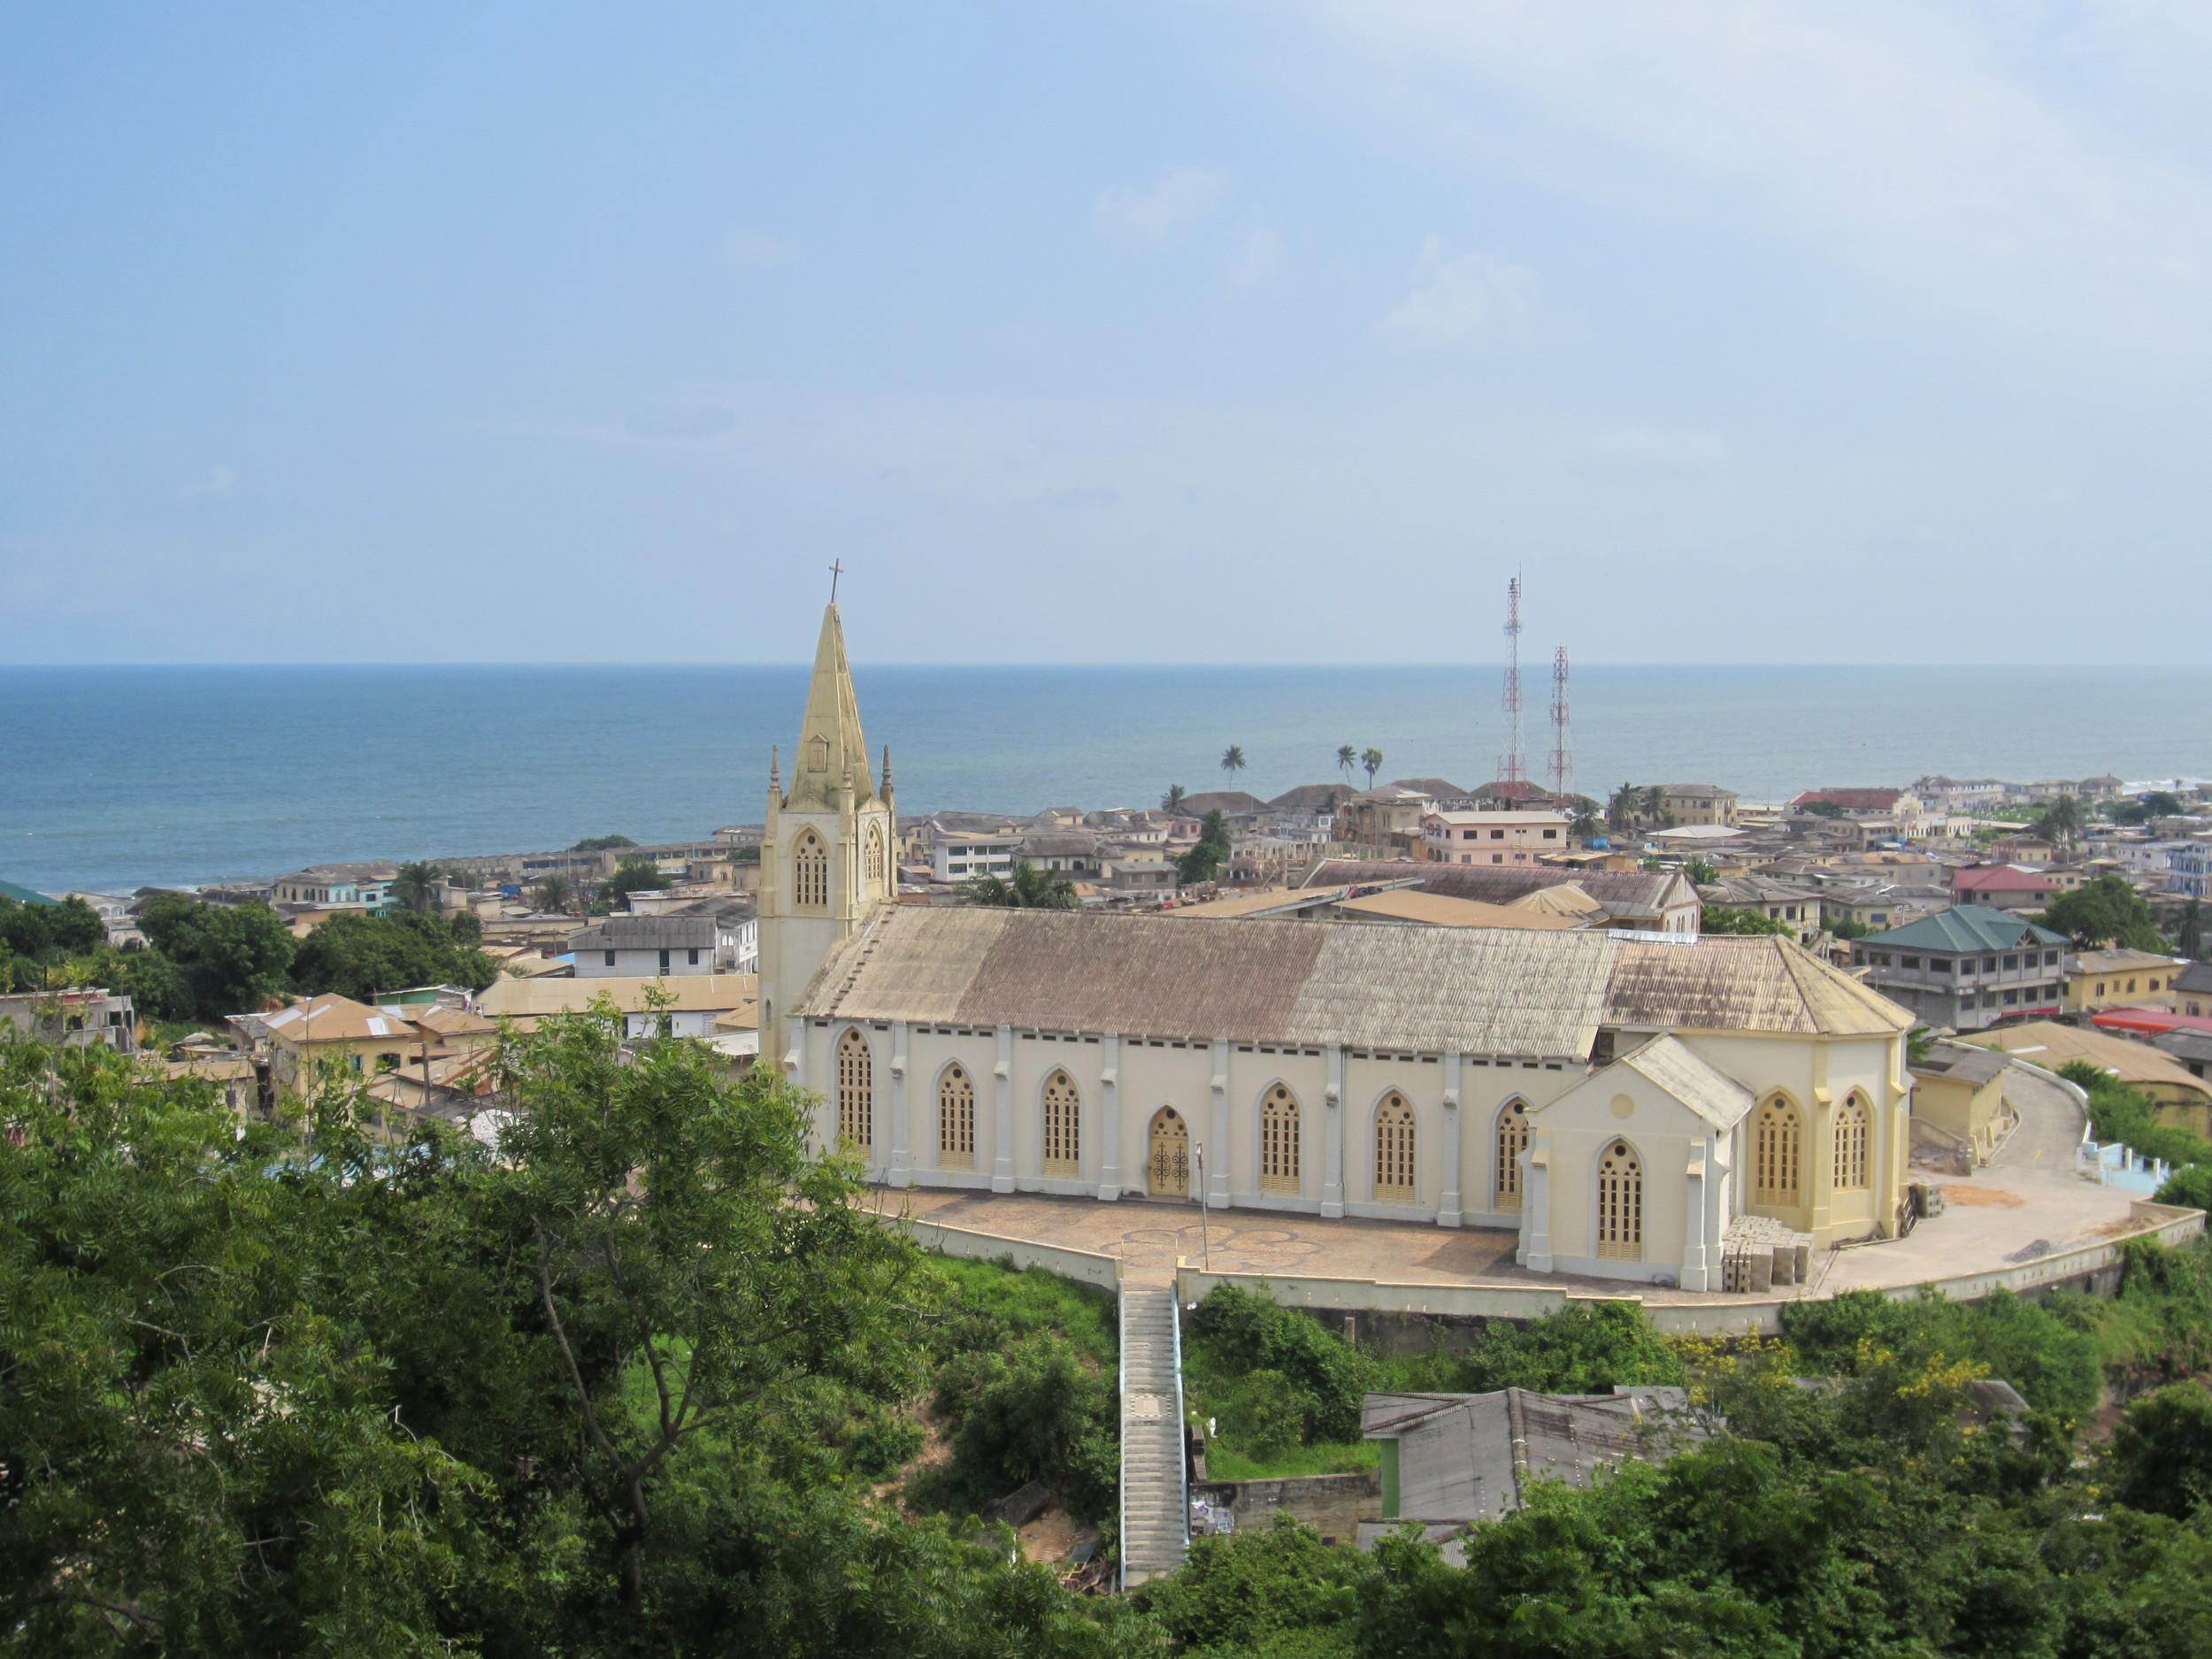 A vista from Cape Coast, Ghana